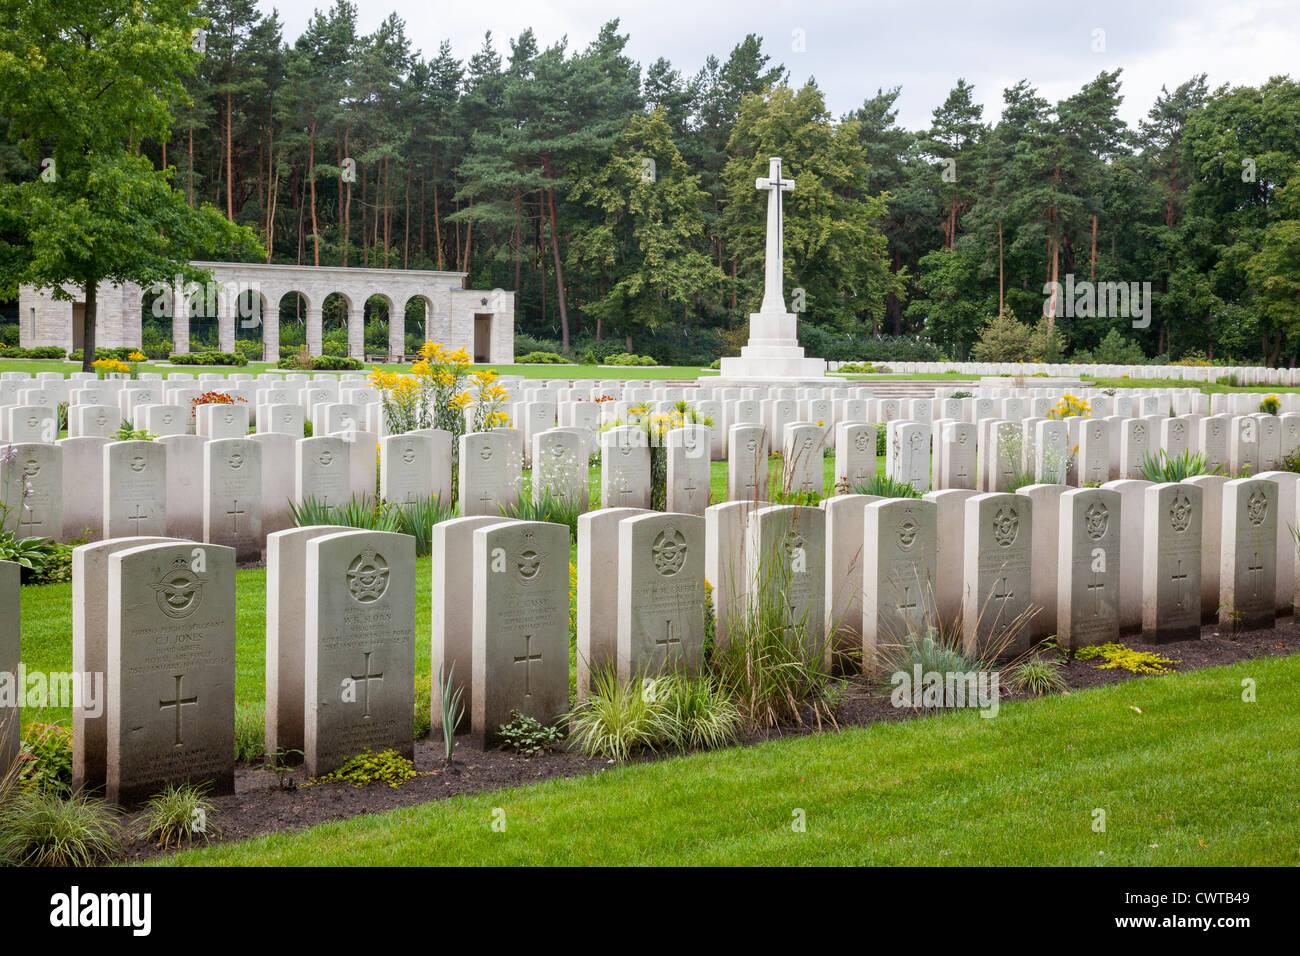 Commonwealth War Cemetery, Heerstrasse, Berlin, Germany - Stock Image